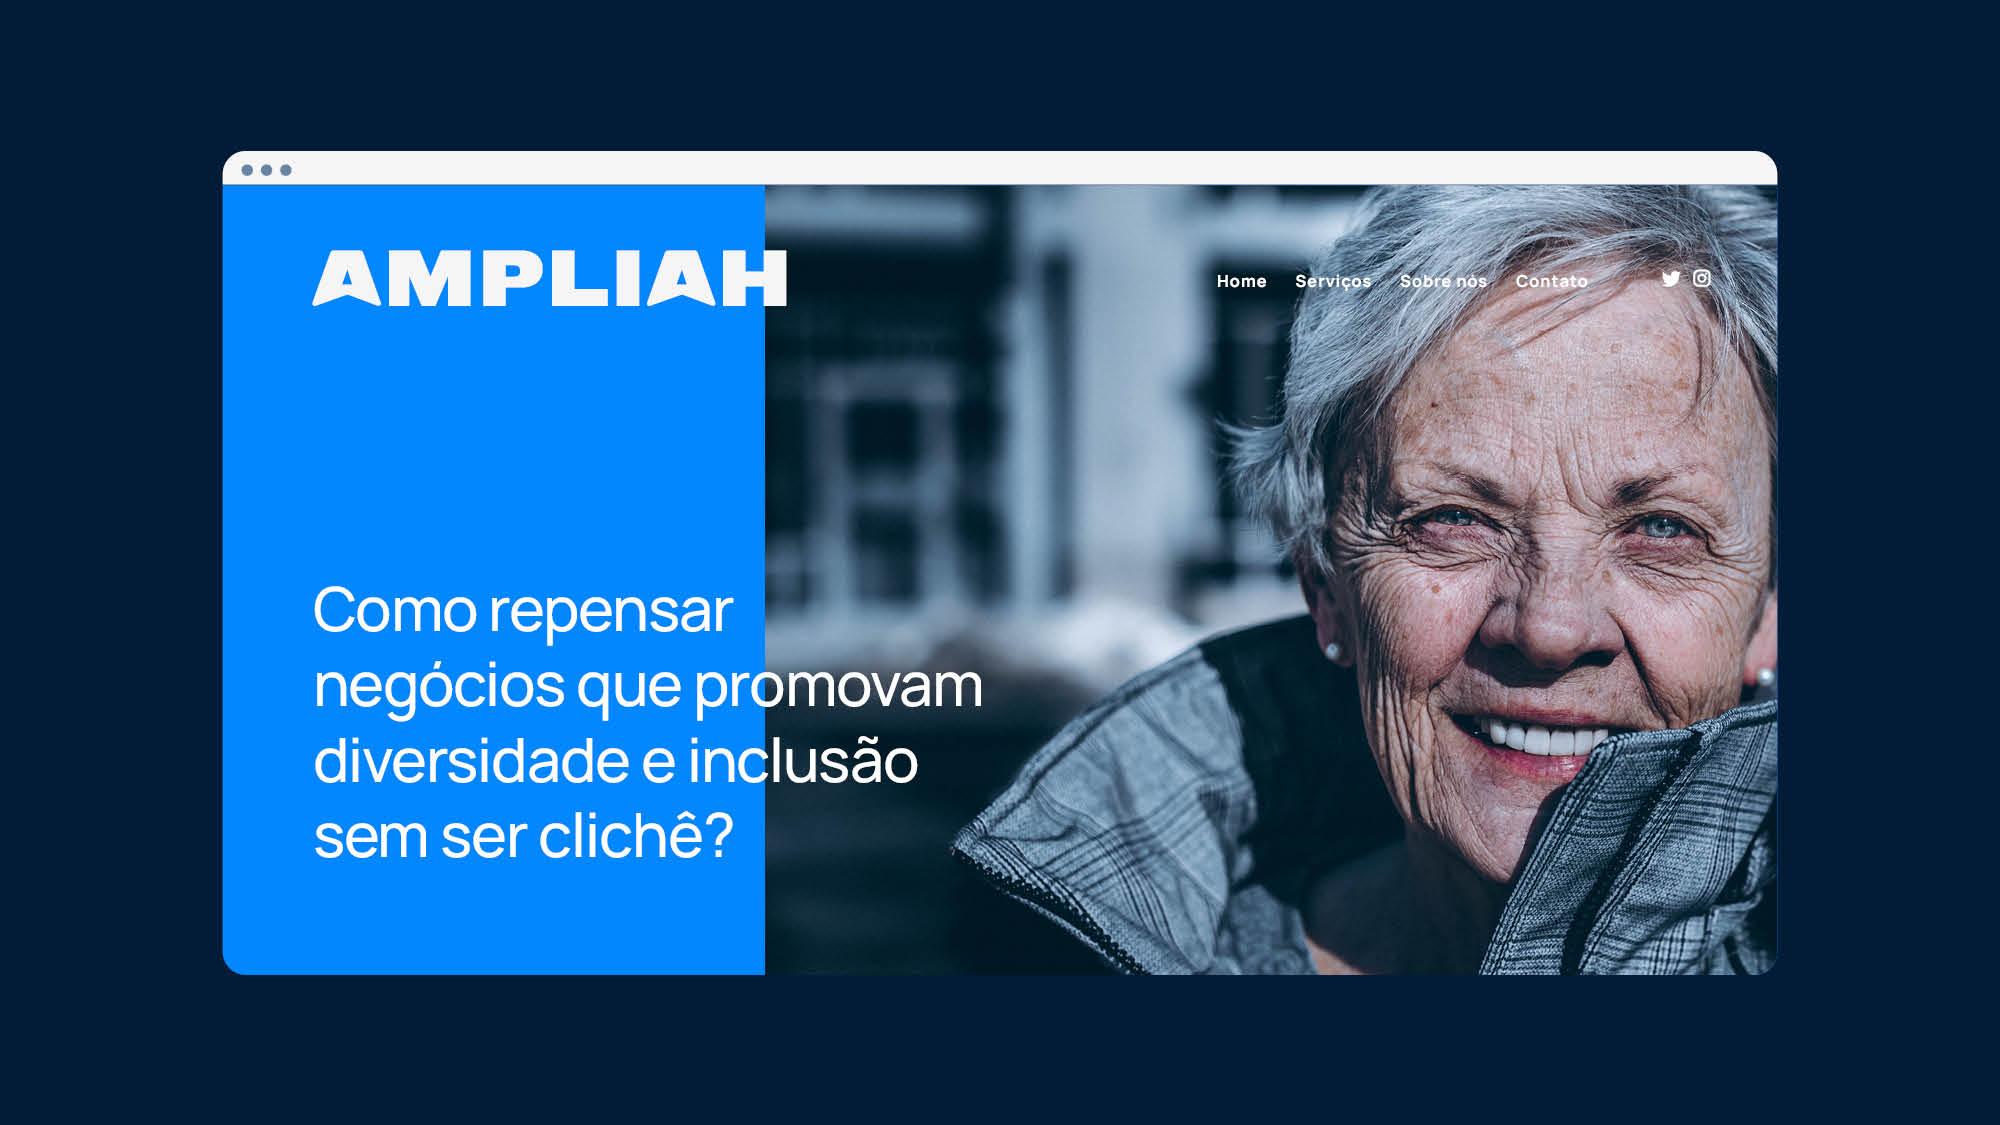 Lanatta-Branding-and-Design-Ampliah10